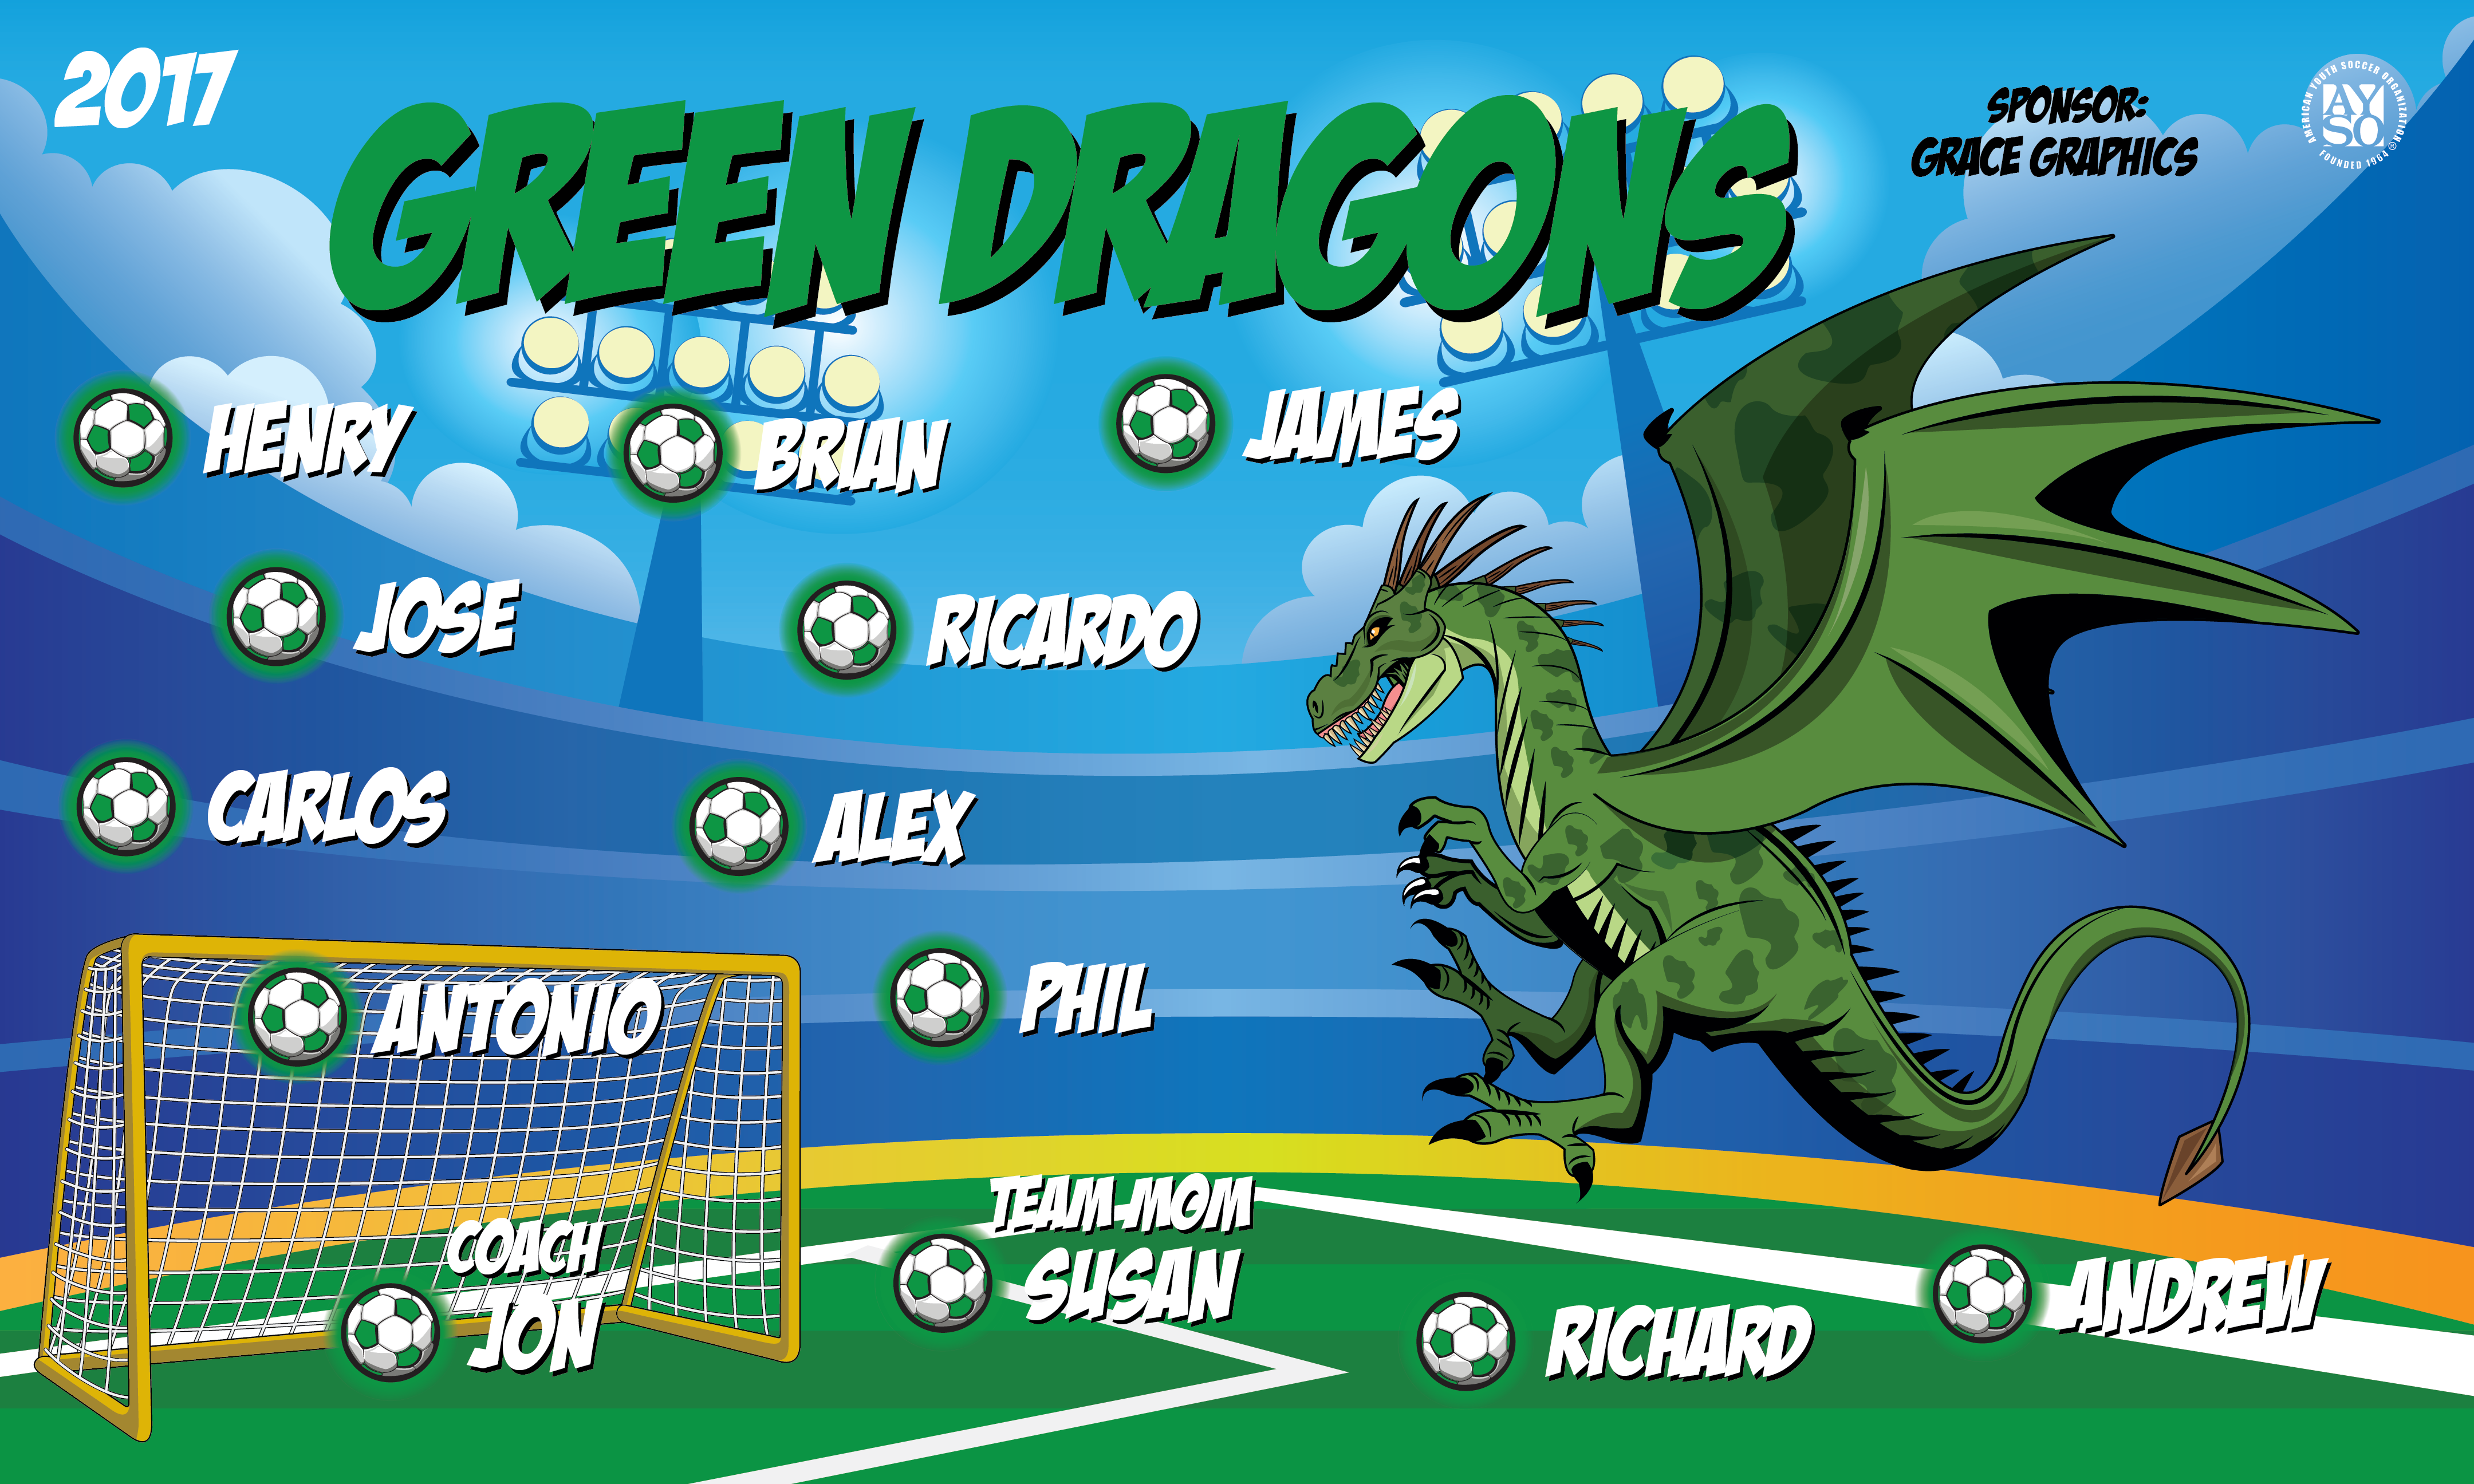 Green Dragons Banners Cute Graduation Banners